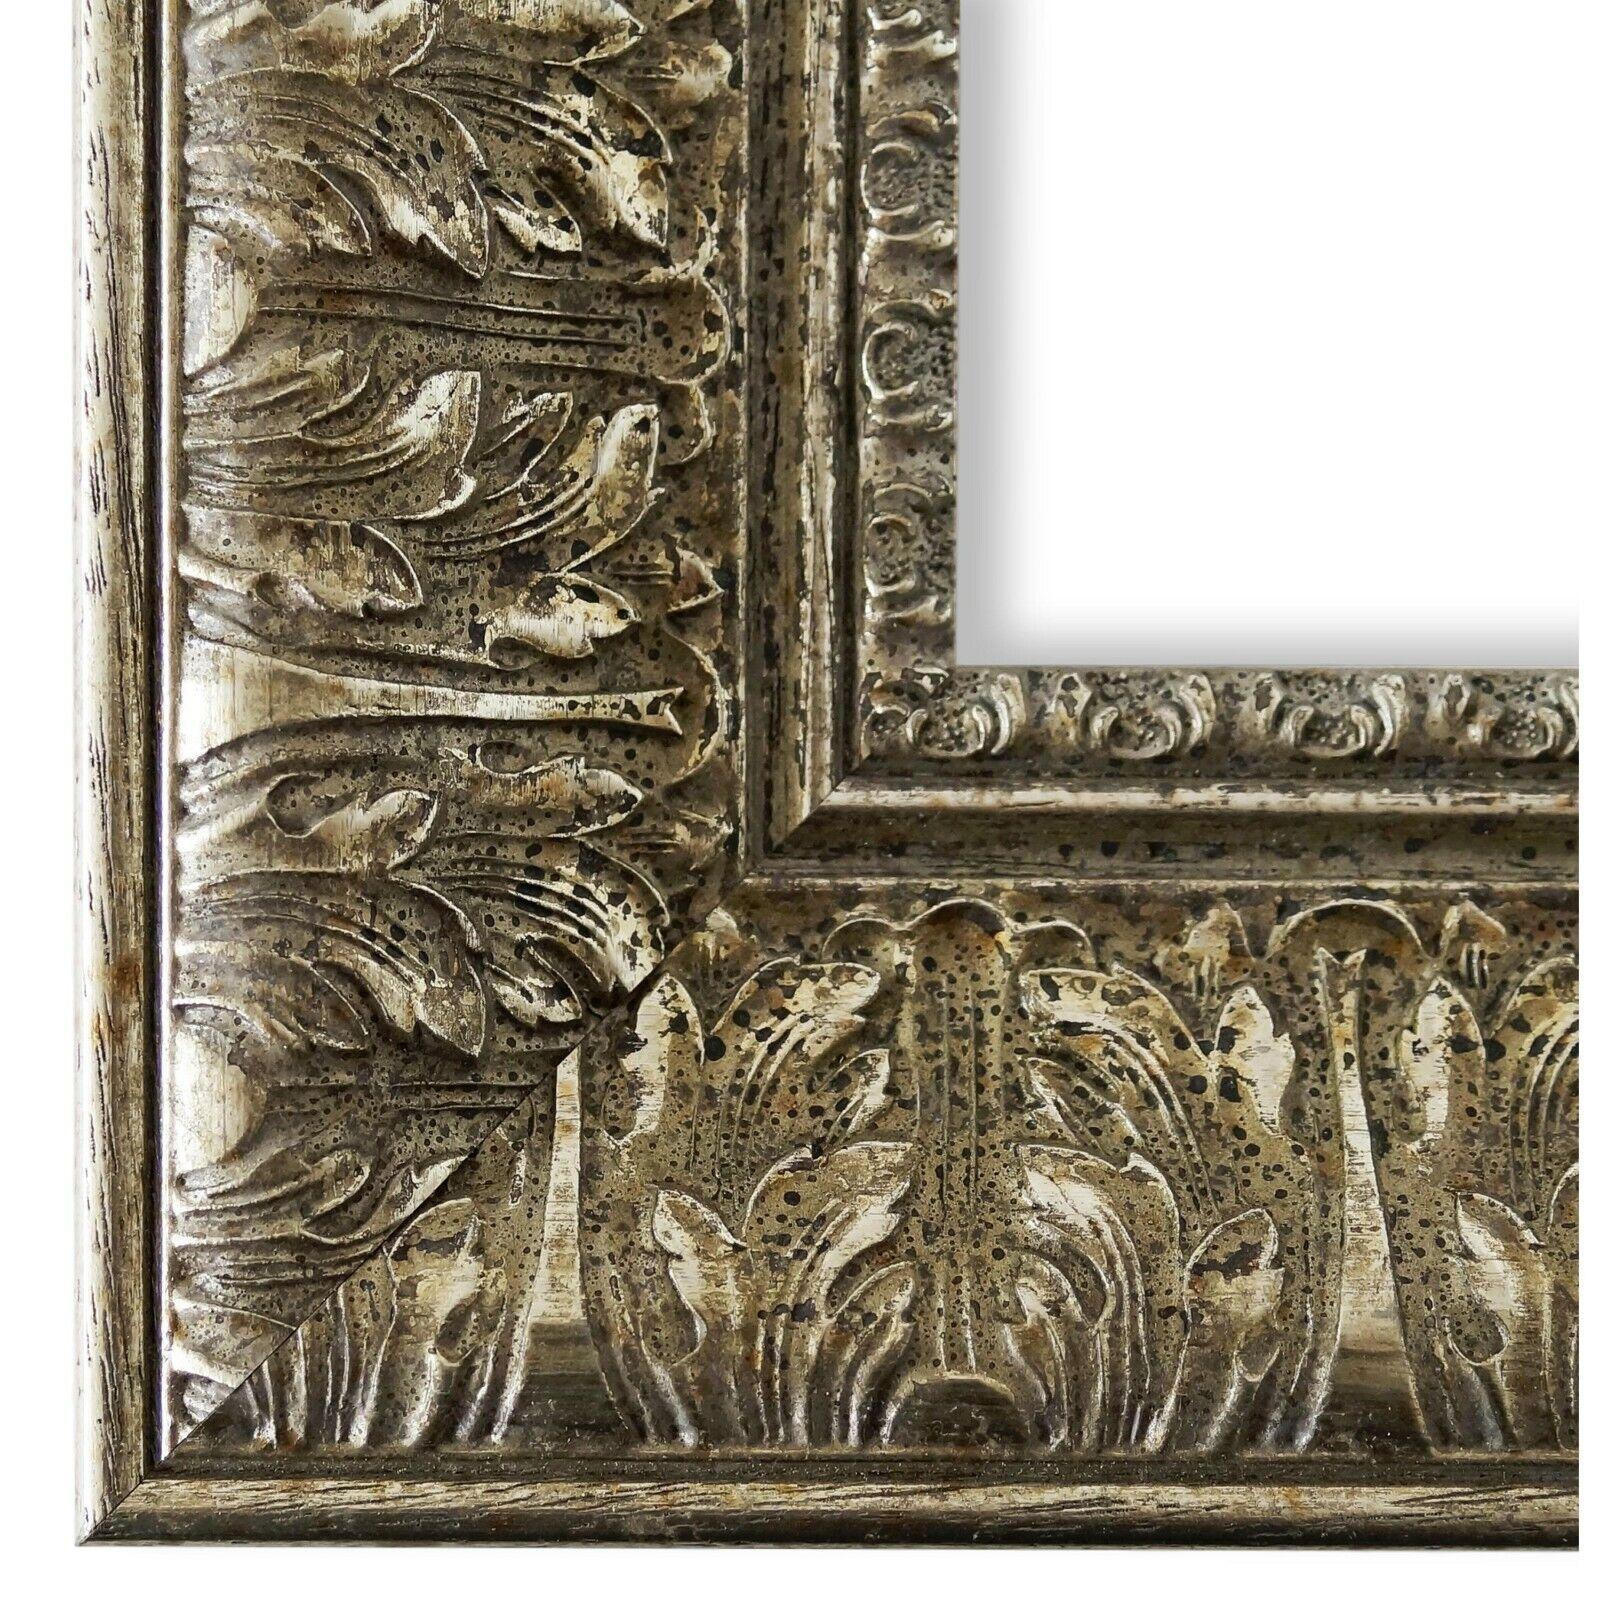 Bilderrahmen Ancona Silber - 9x13 10x10 10x15 13x18 15x20 18x24 20x20 20x30